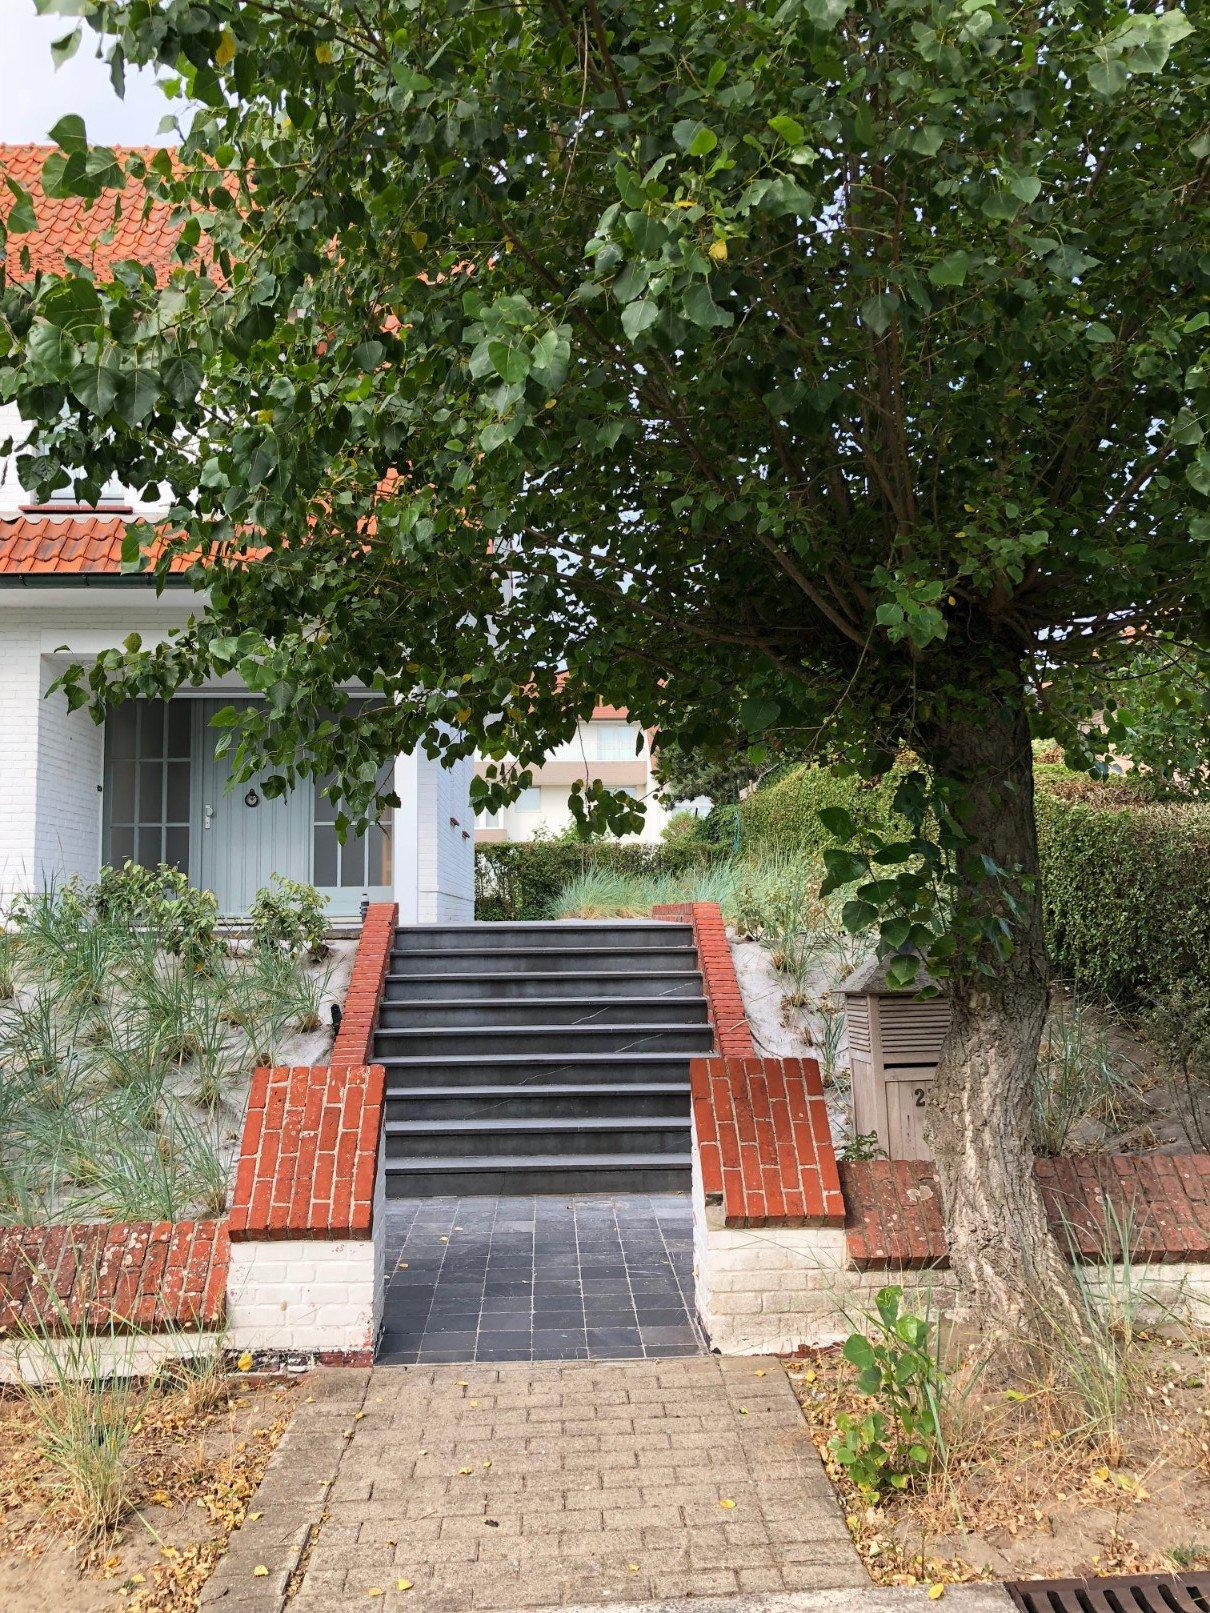 Rietveldprojects-Villa Were Di - Te Koop : Te Huur (per week)21